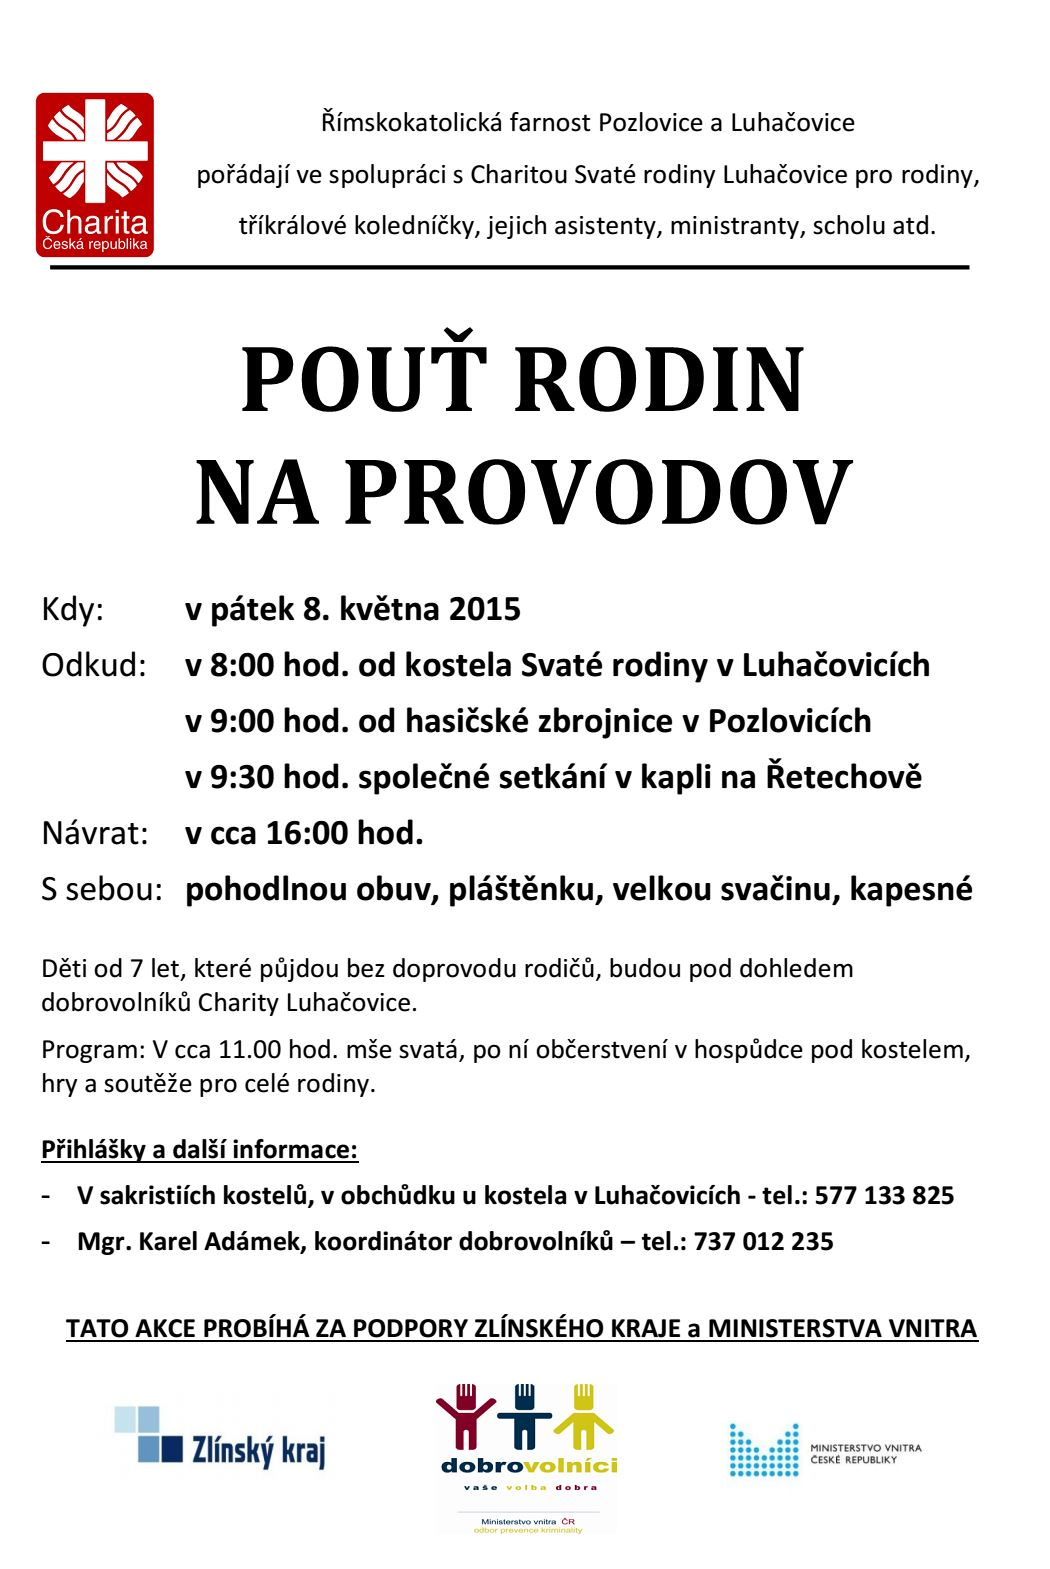 Pouť rodin na Provodov - 8. 5. 2015